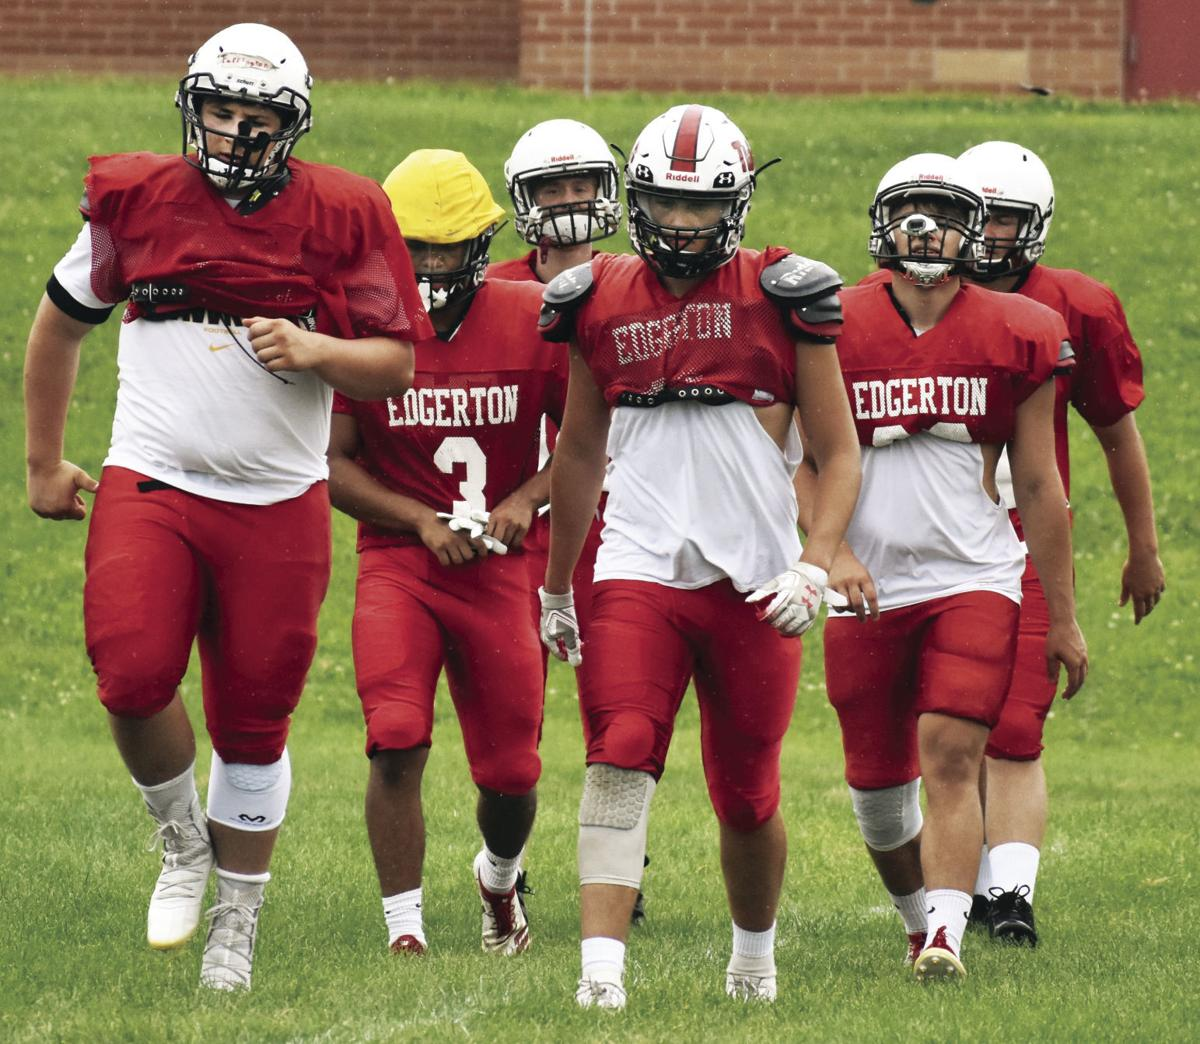 Prep football photo: Edgerton senior linemen Reed Farrington, Ben Wileman lead the Crimson Tide into calisthenics